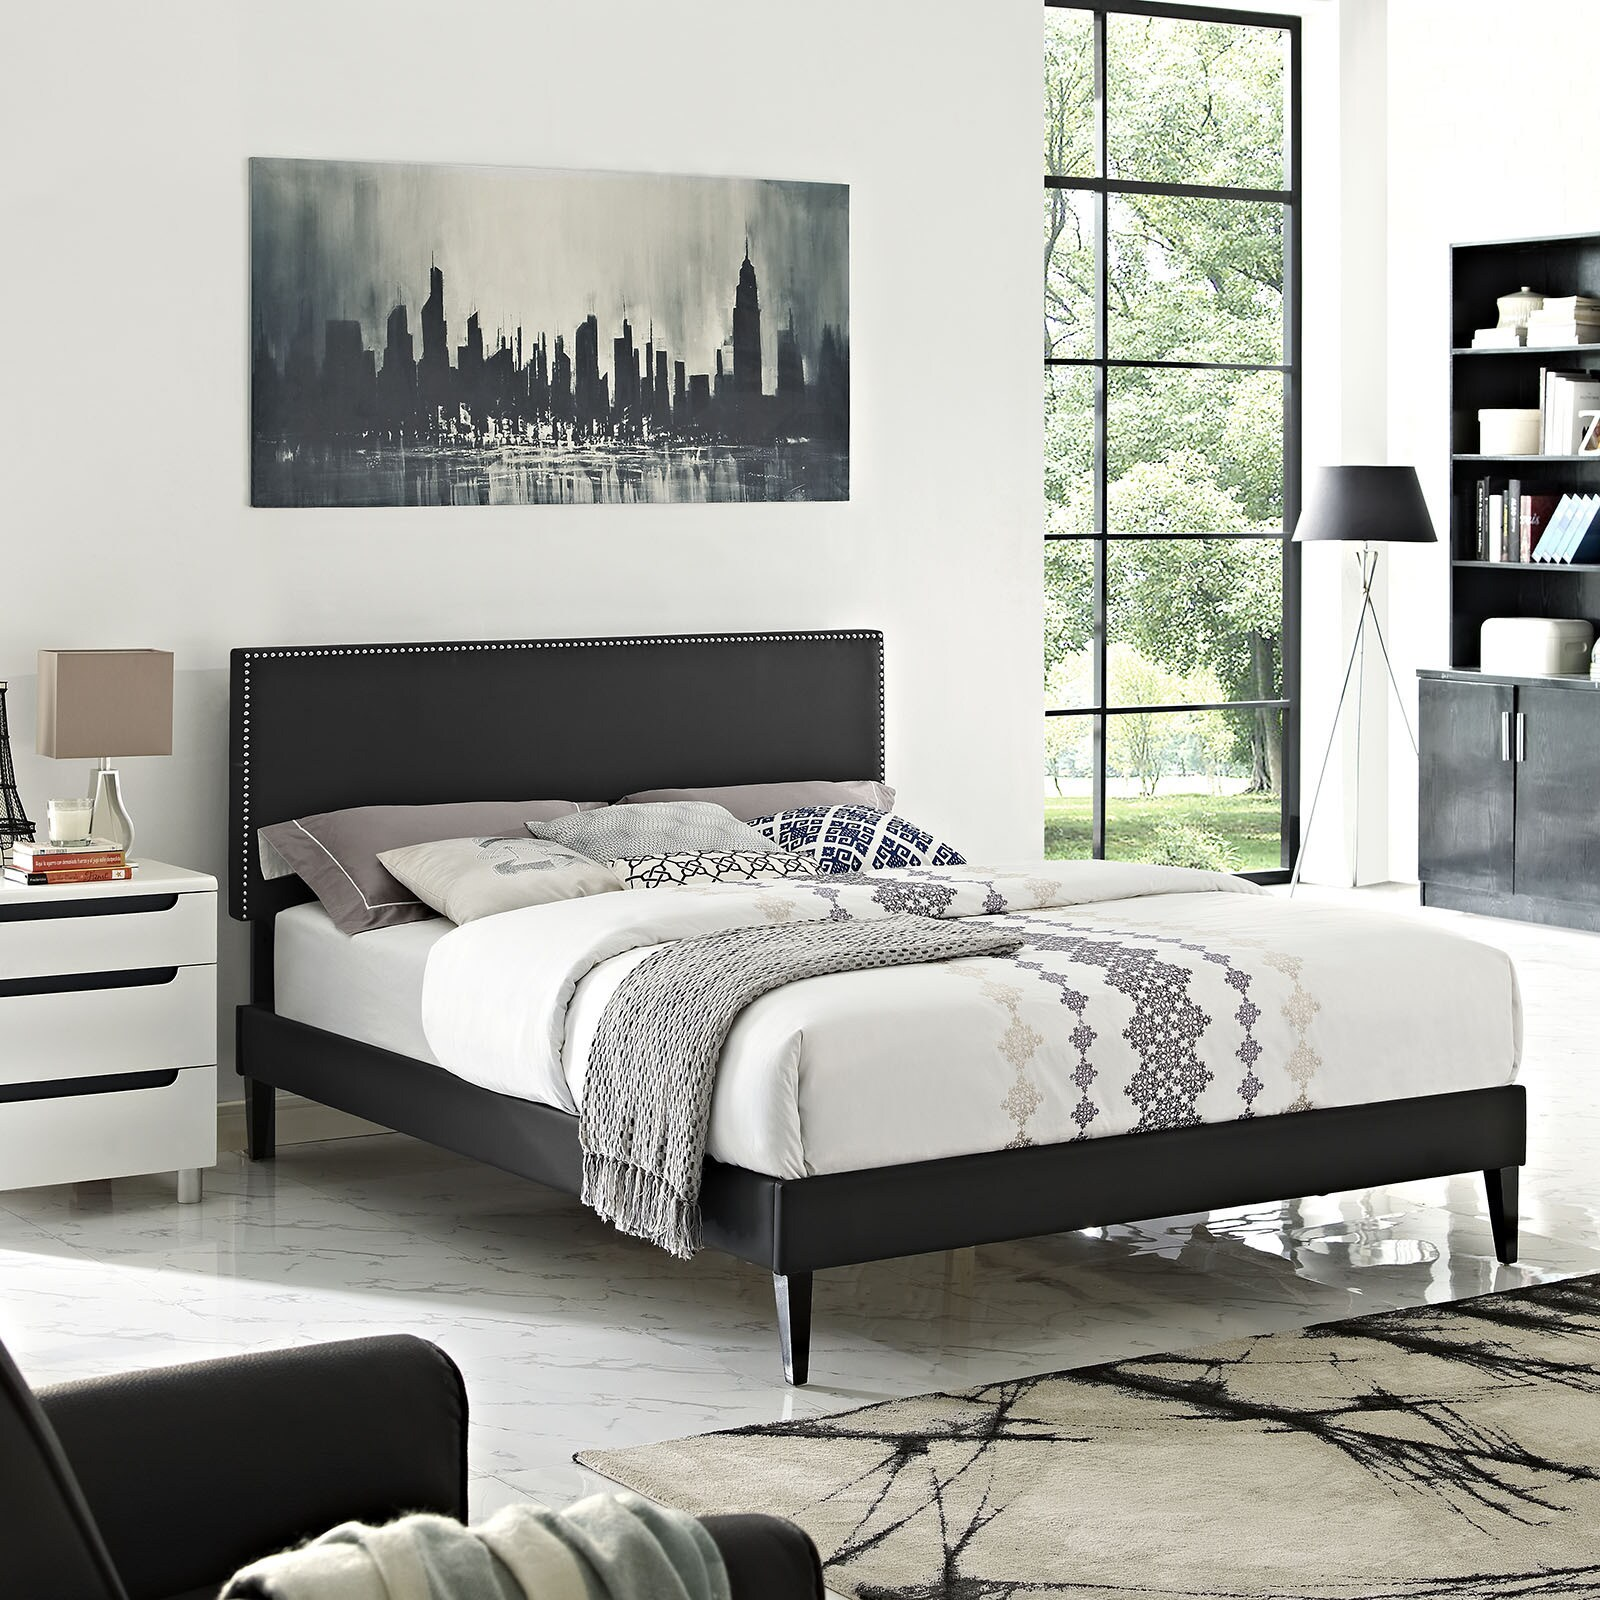 Phoebe Black Vinyl Platform Bed with Squared Tapered Legs